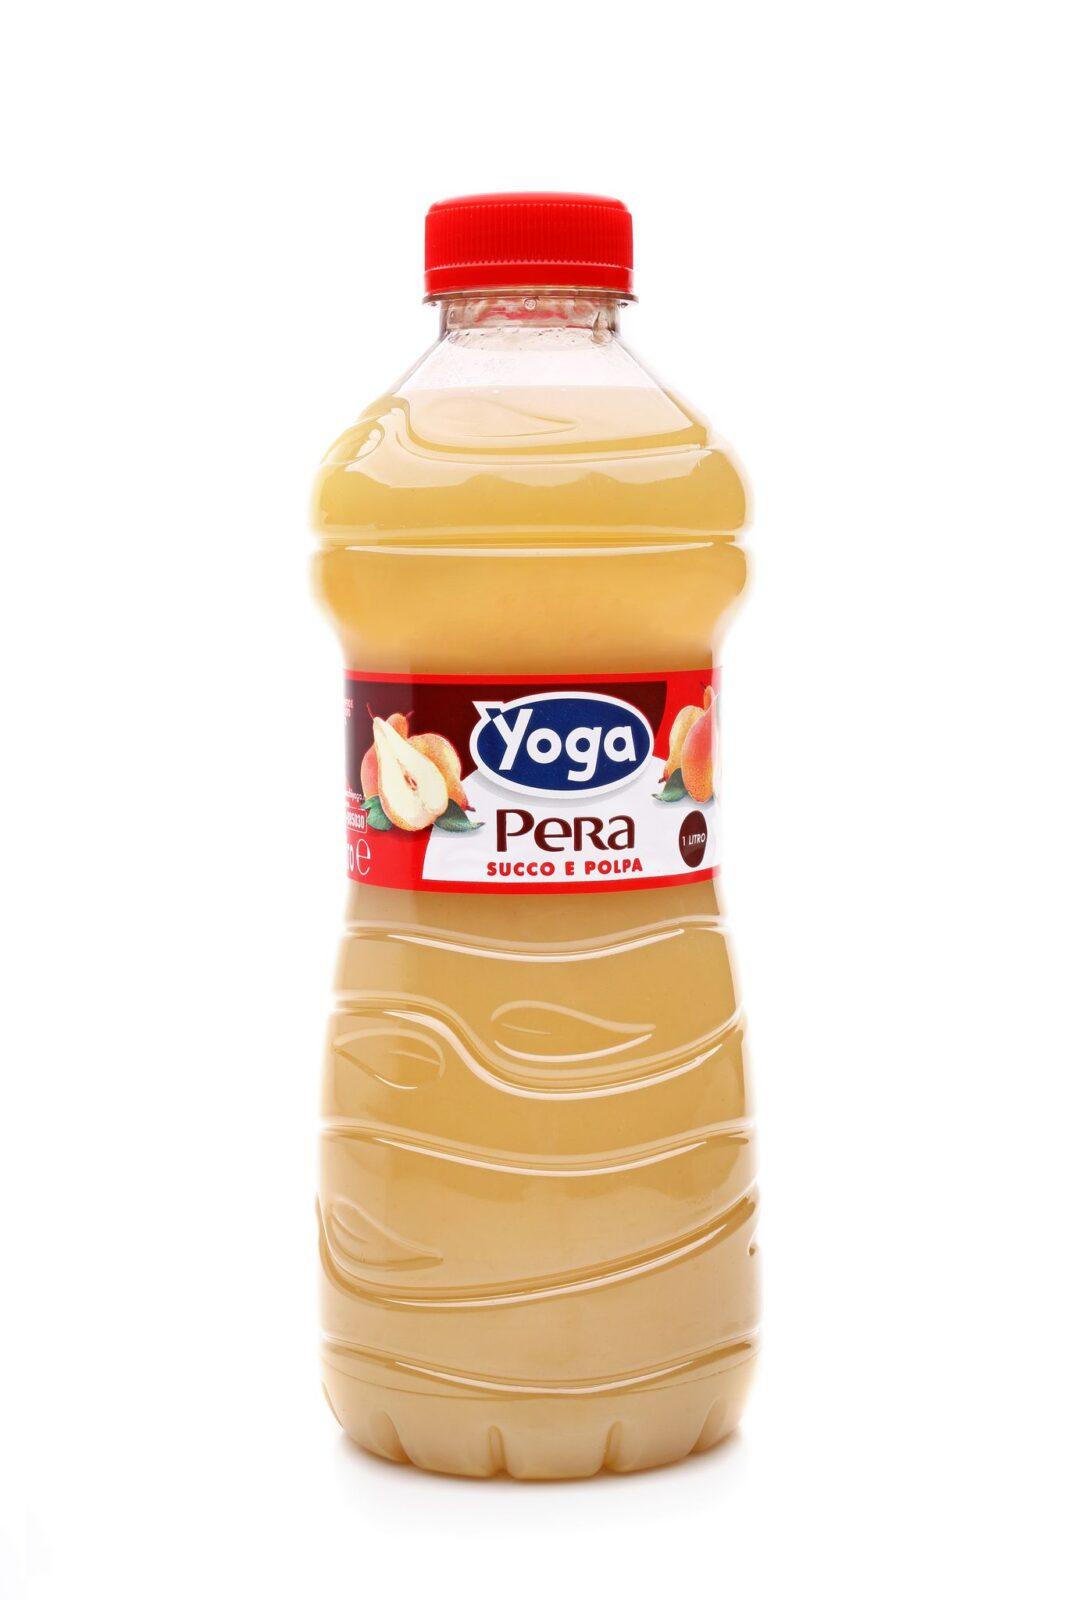 YOGA PERA